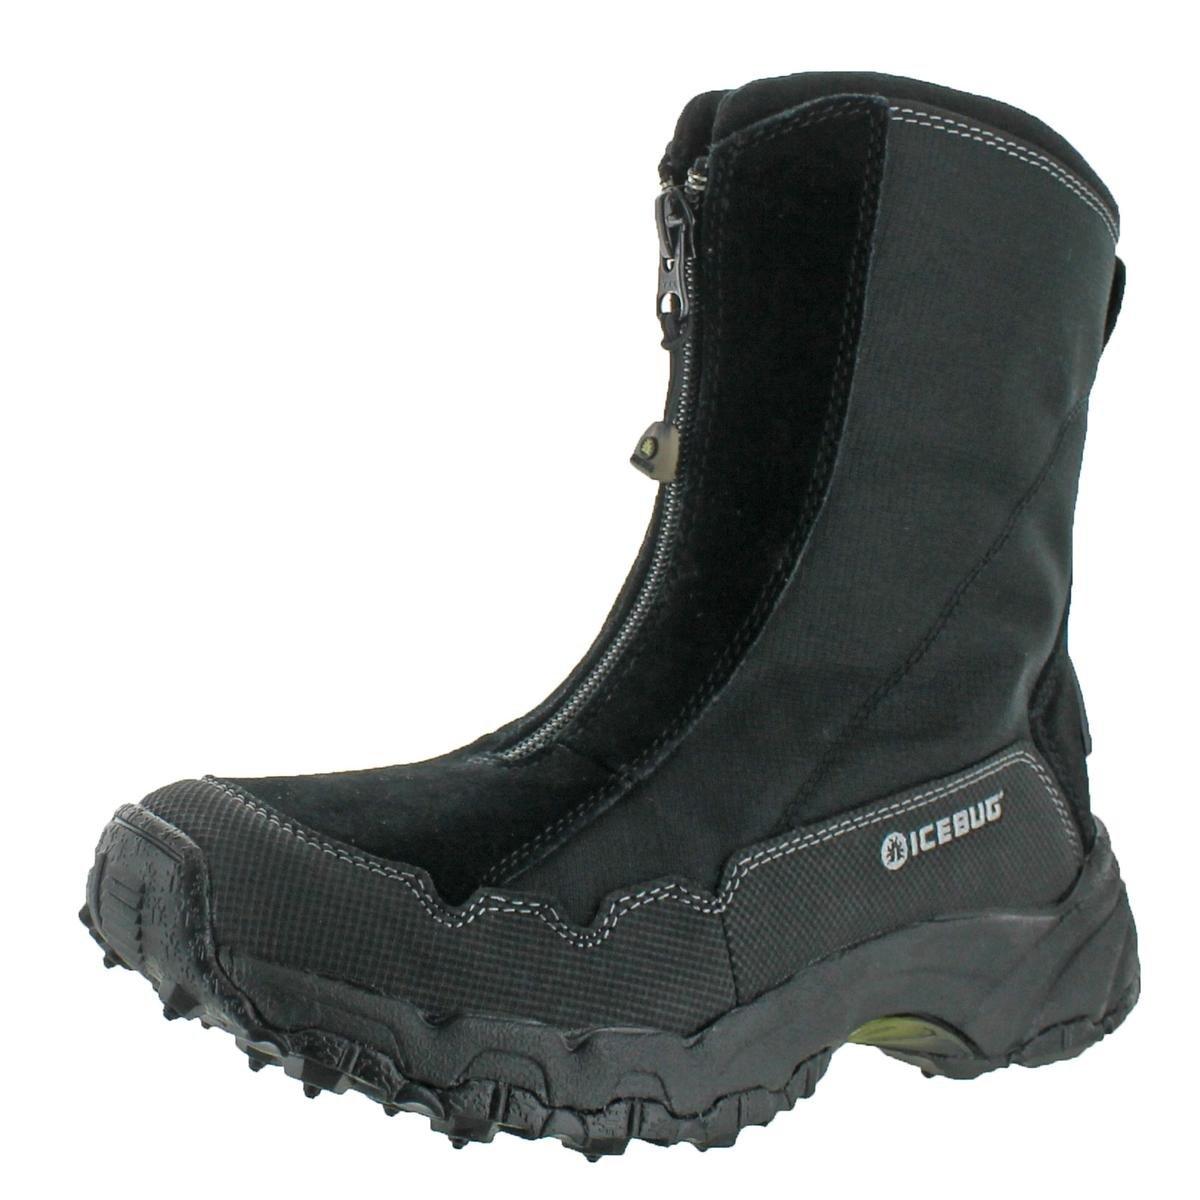 Icebug Women's Ivalo BUGrip Studded Traction Winter Boot,Black,6.5 M US